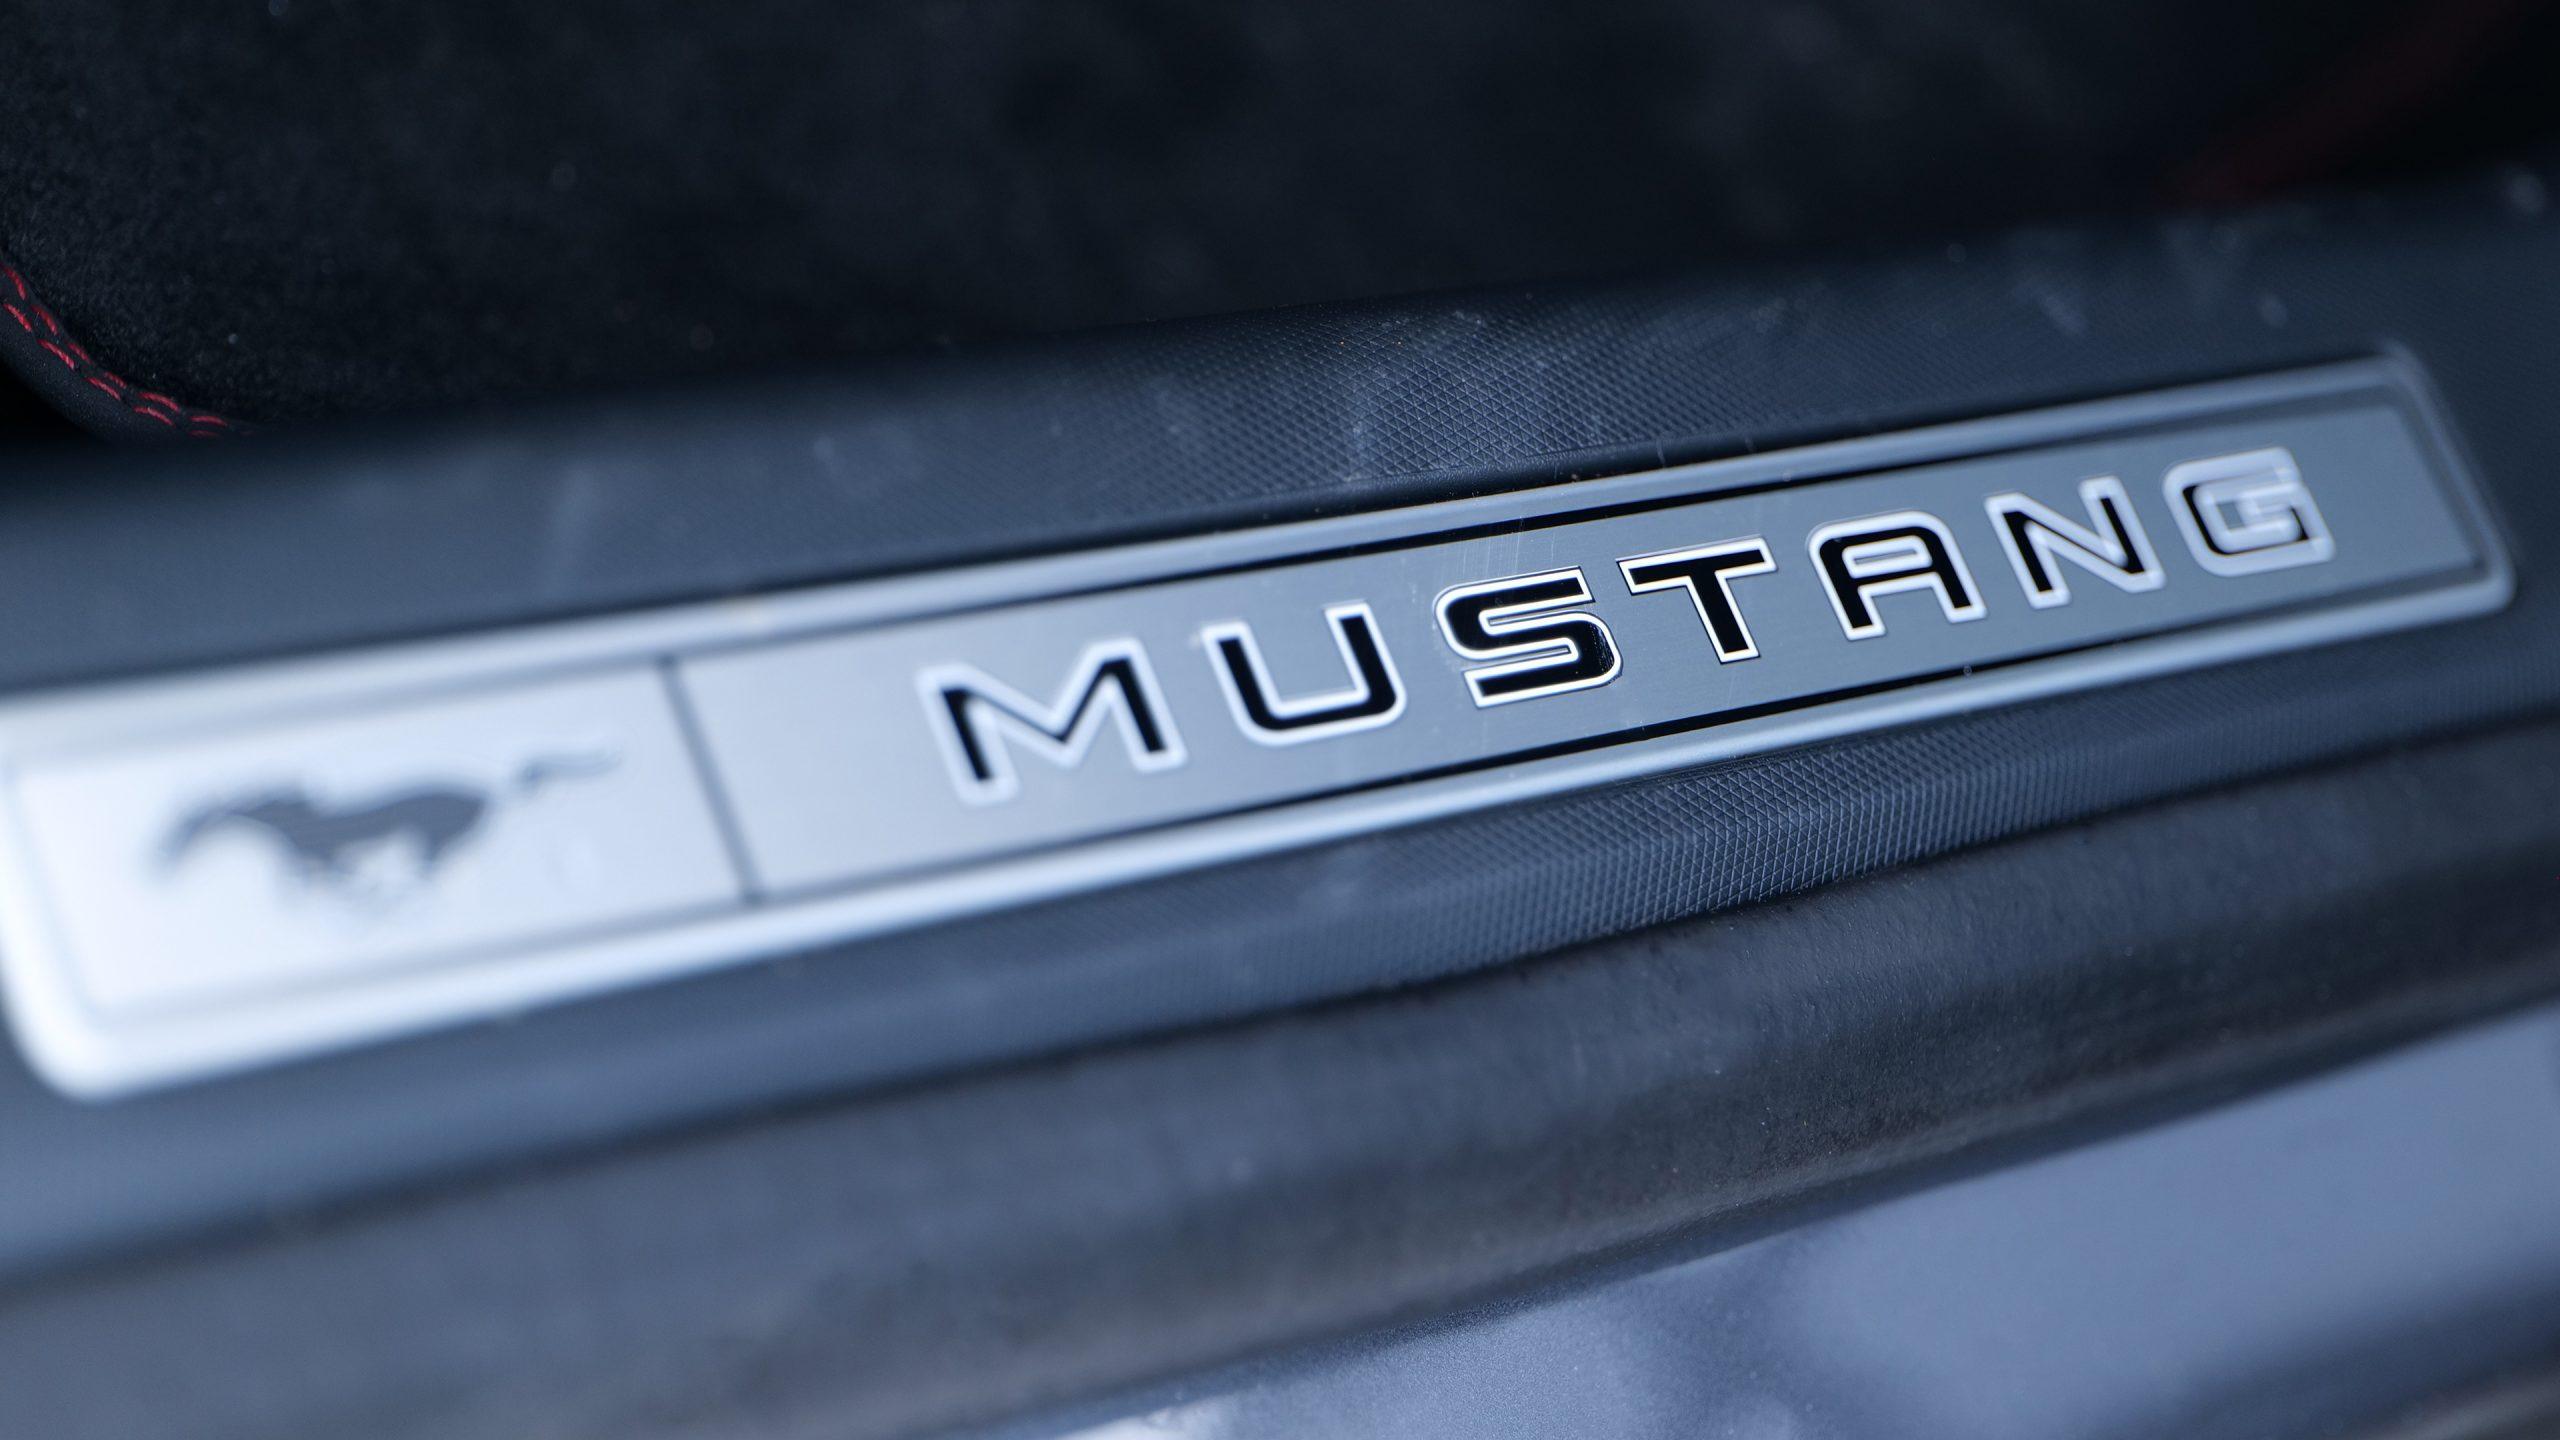 Ford Mustang Mach-E logo trunk